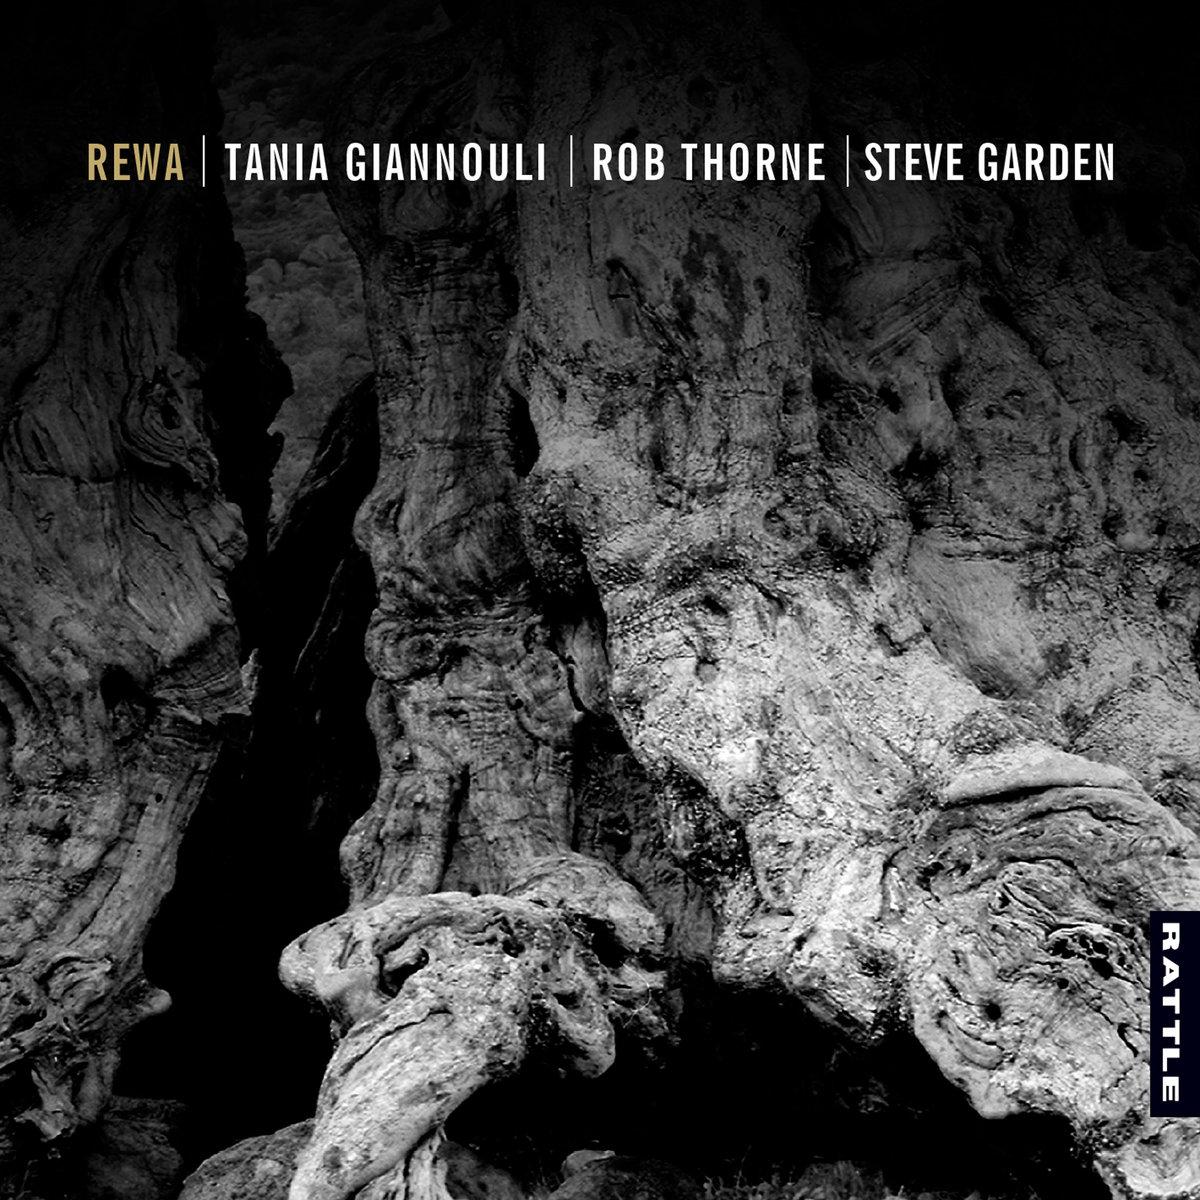 Review: Giannouli/Thorne/Garden – Rewa (Rattle Records, 2018)